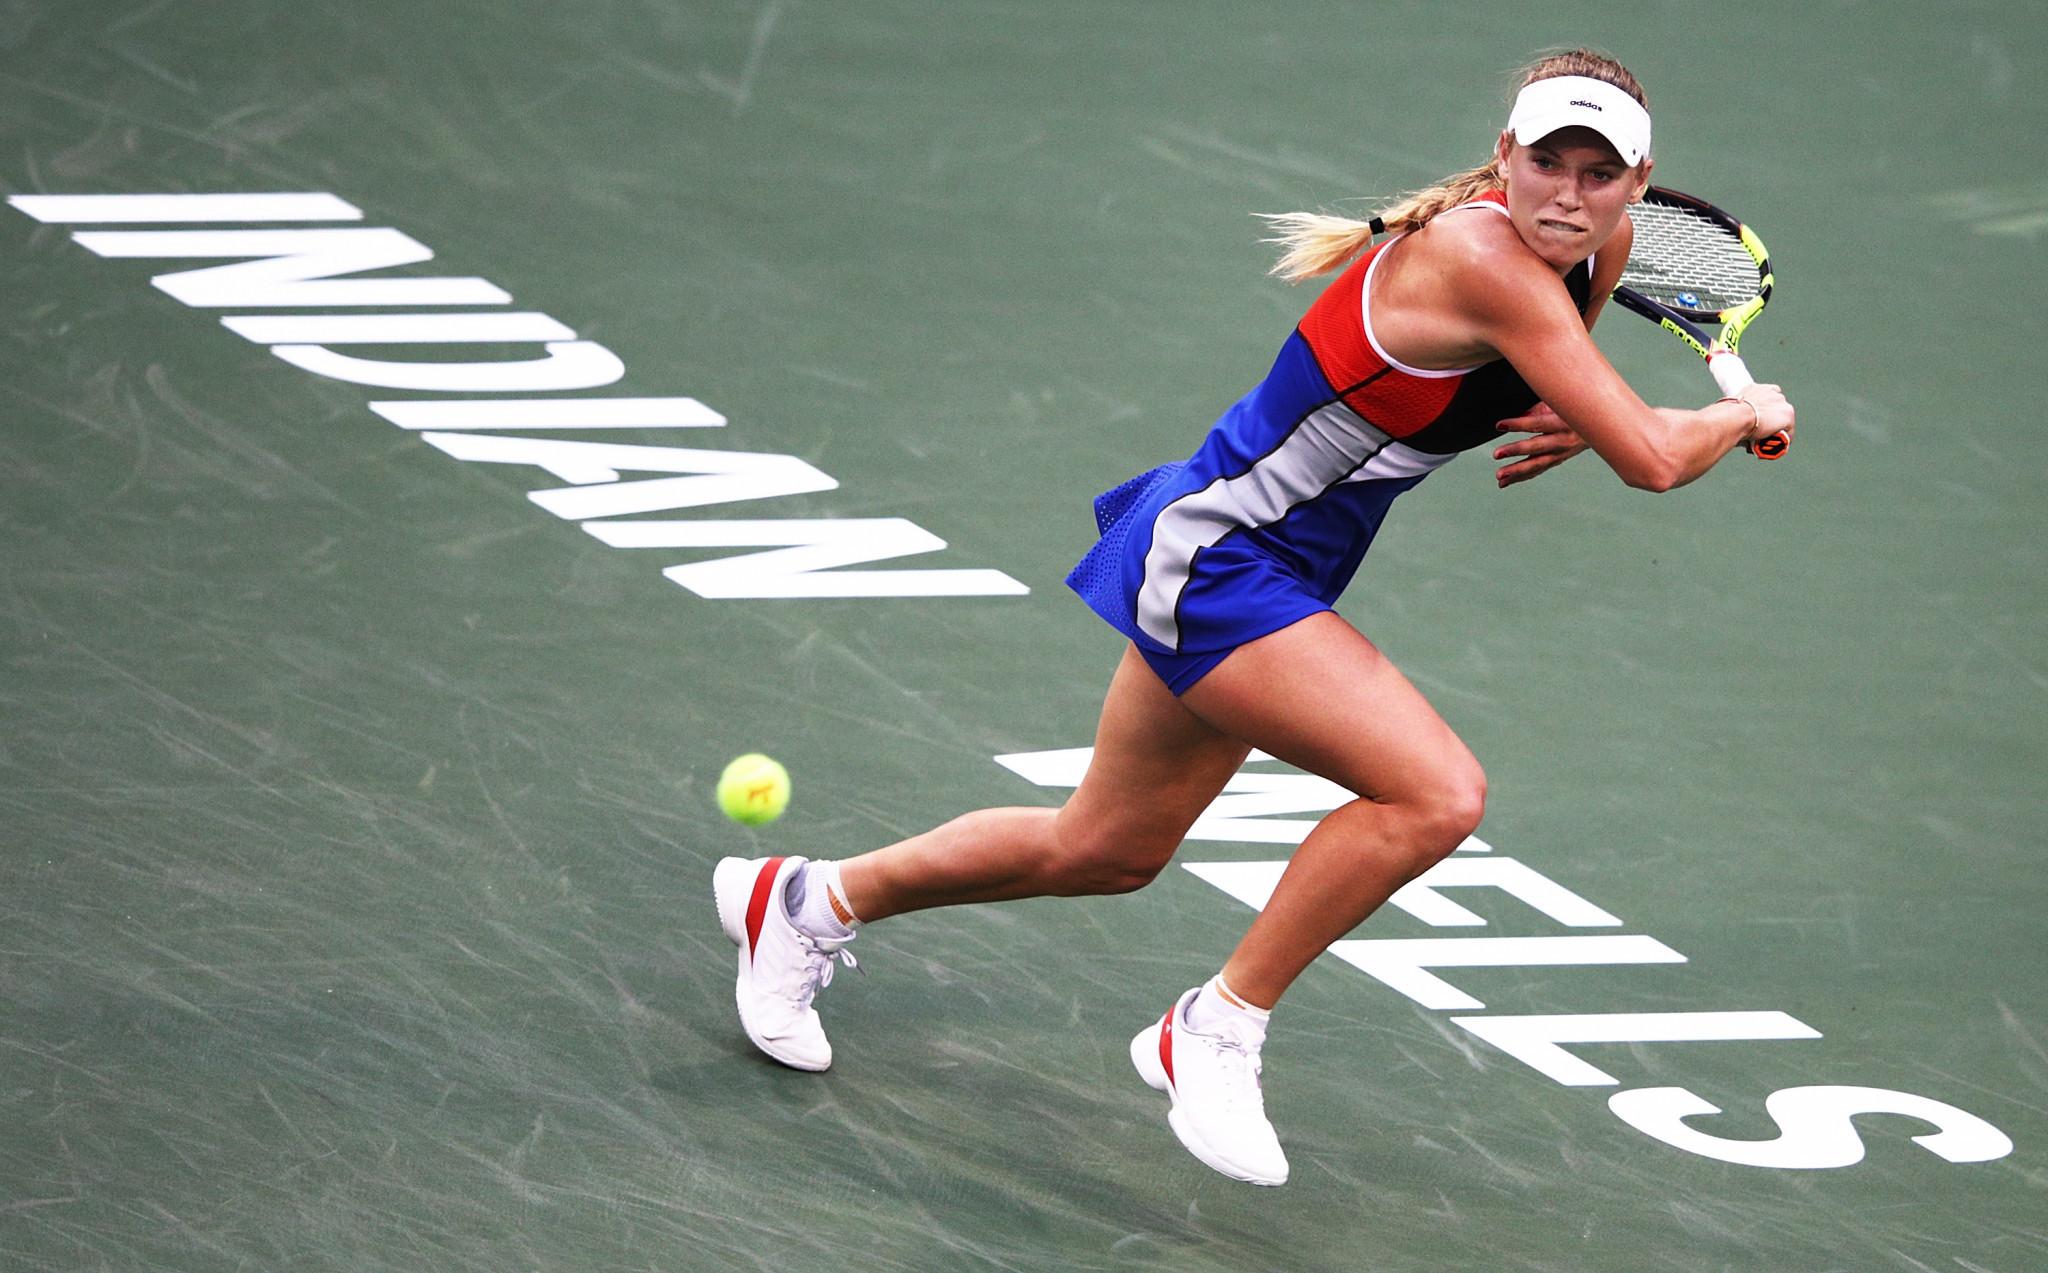 Denmark's Australian Open champion Caroline Wozniacki beat Spain's Lara Arruabarrena in the second round